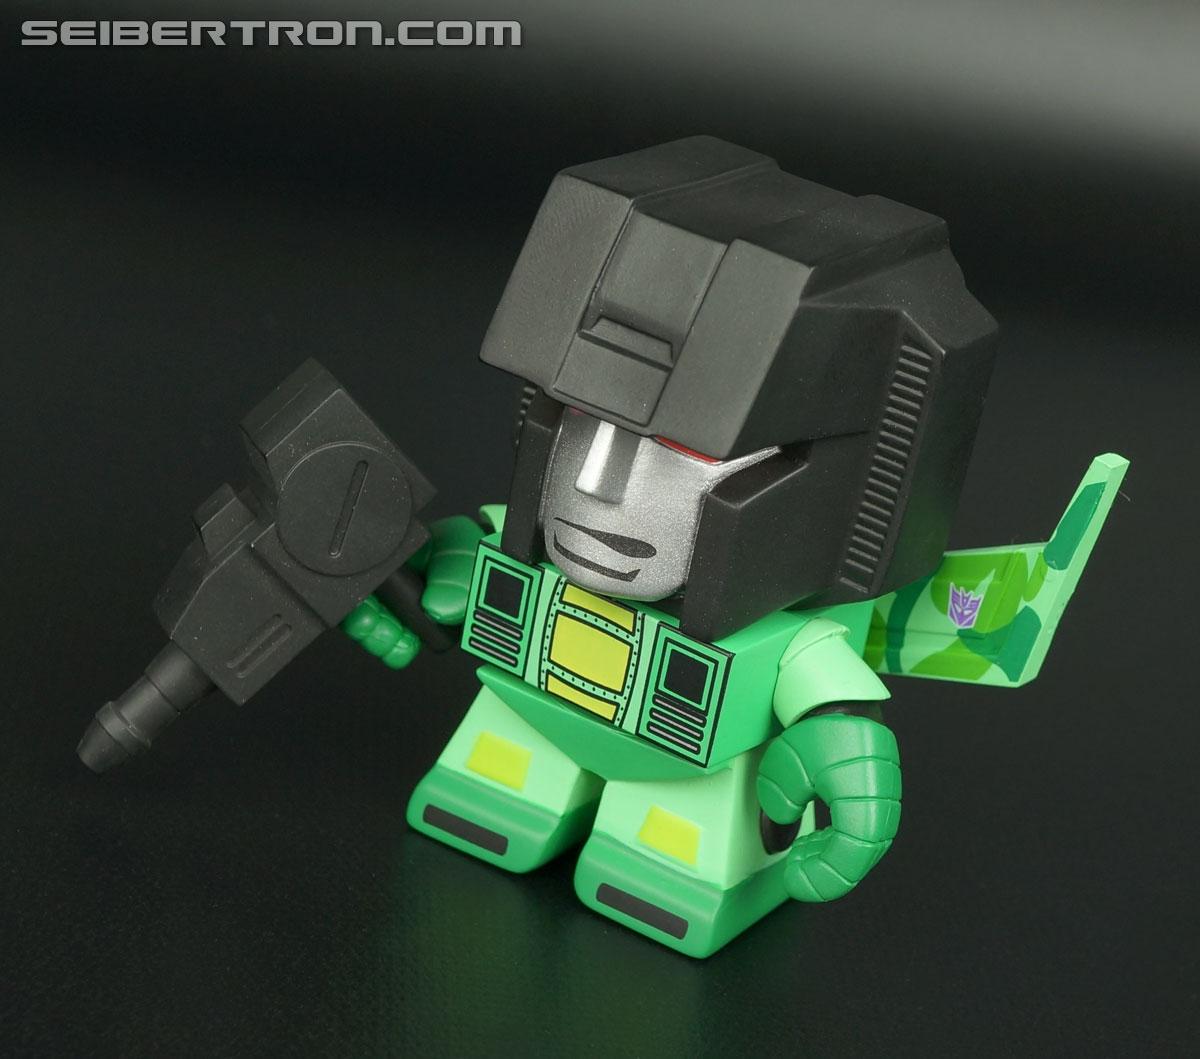 Transformers Loyal Subjects Rainmaker (Green) (Acid Storm) (Image #25 of 40)